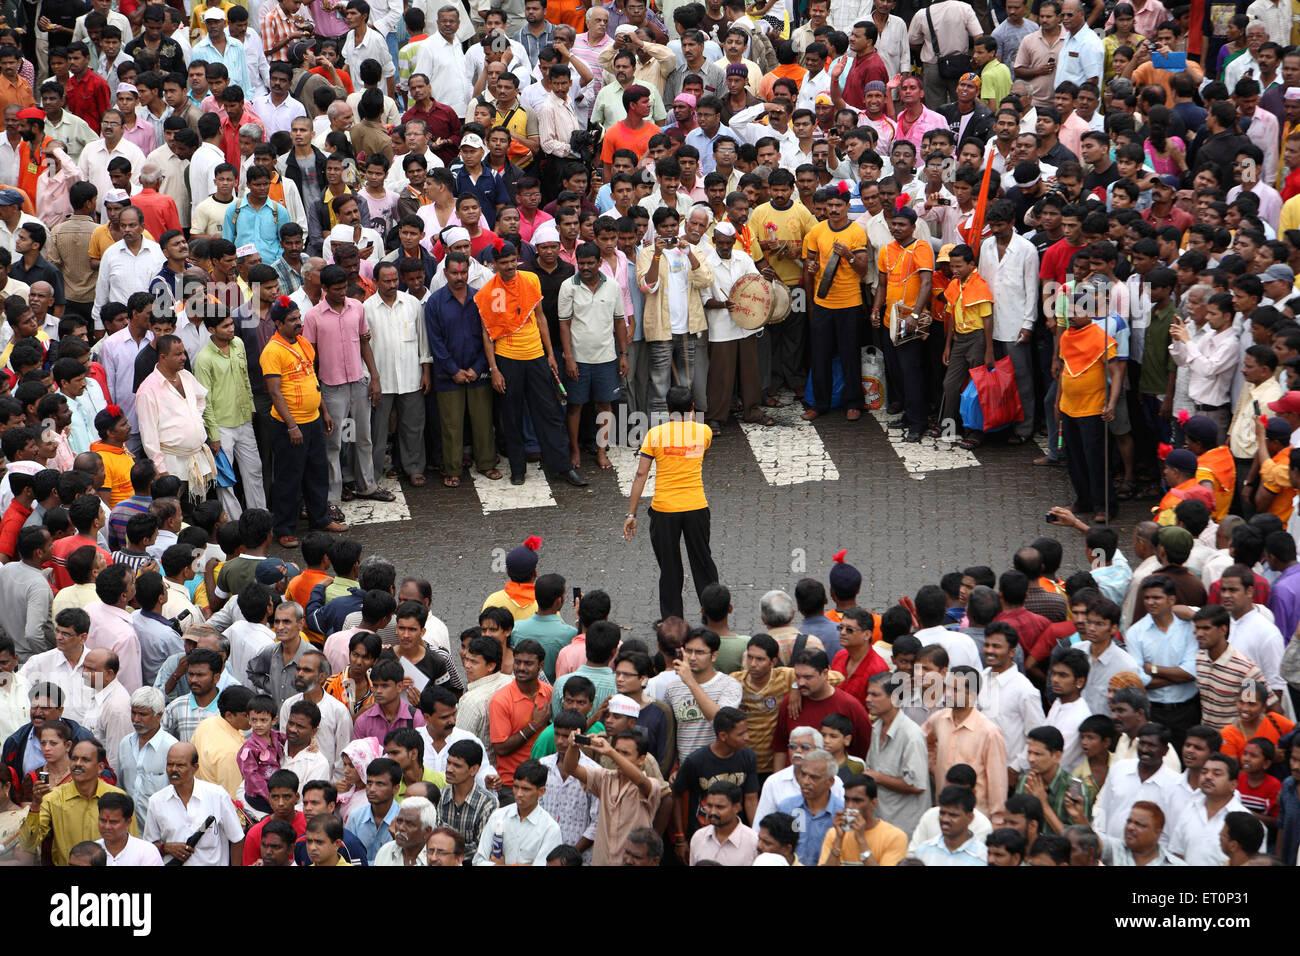 Man performing stunts during immersion of lord ganesh festival ; Bombay Mumbai ; Maharashtra; India - Stock Image